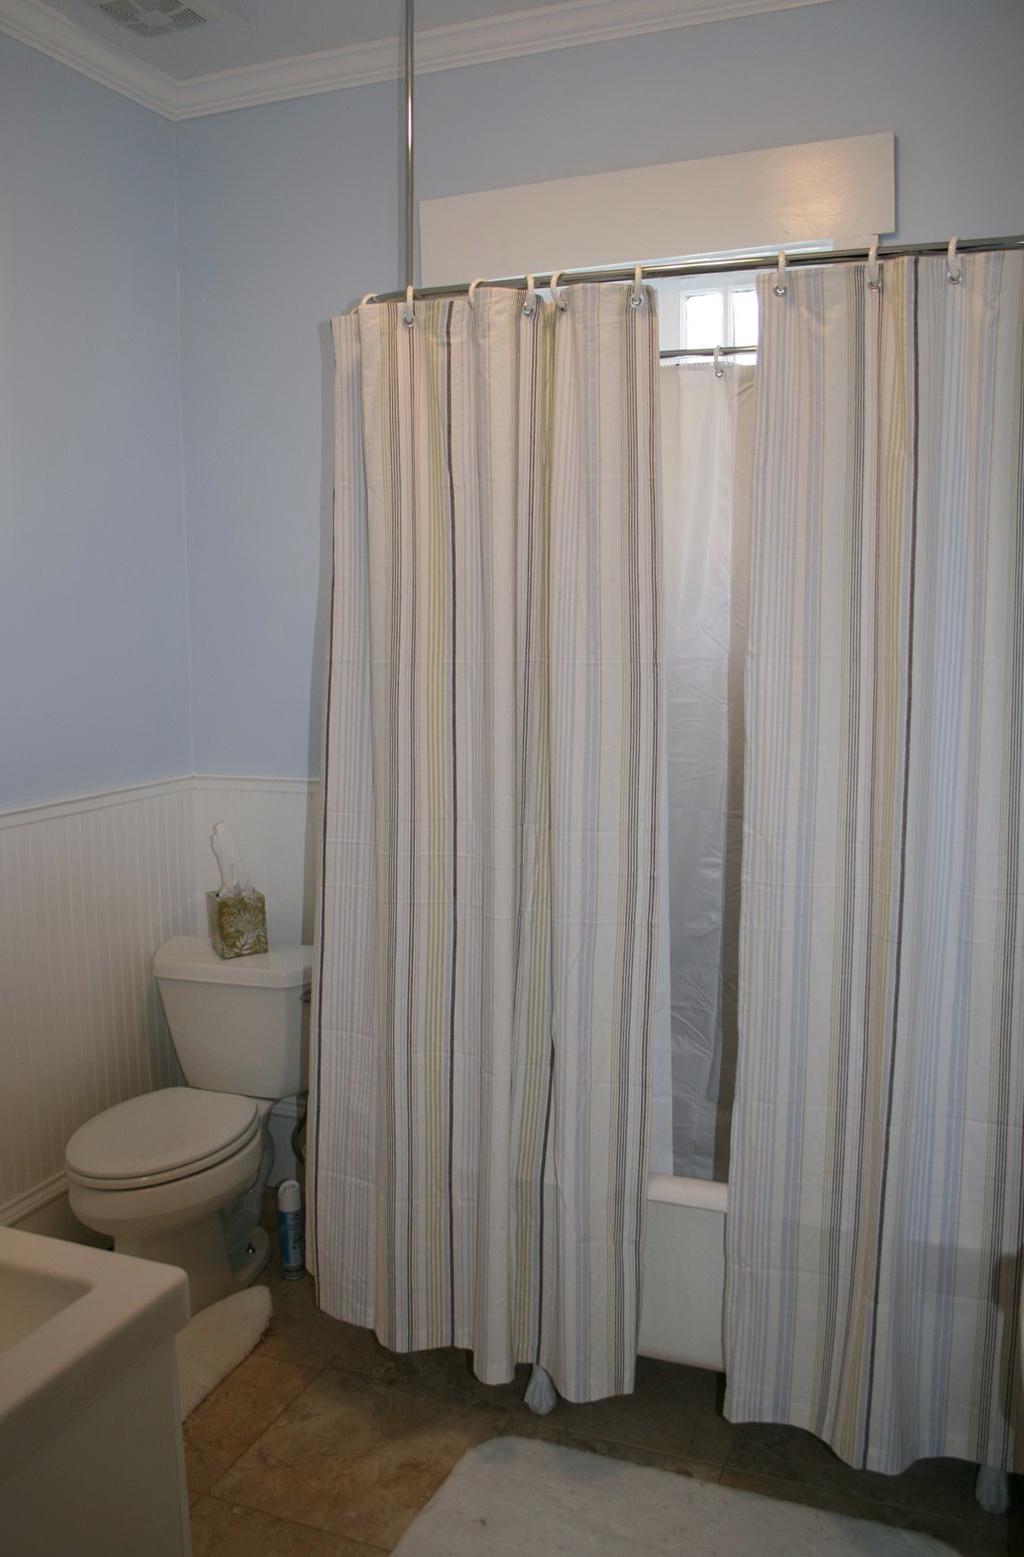 Shower Curtain Ideas For Clawfoot Tub